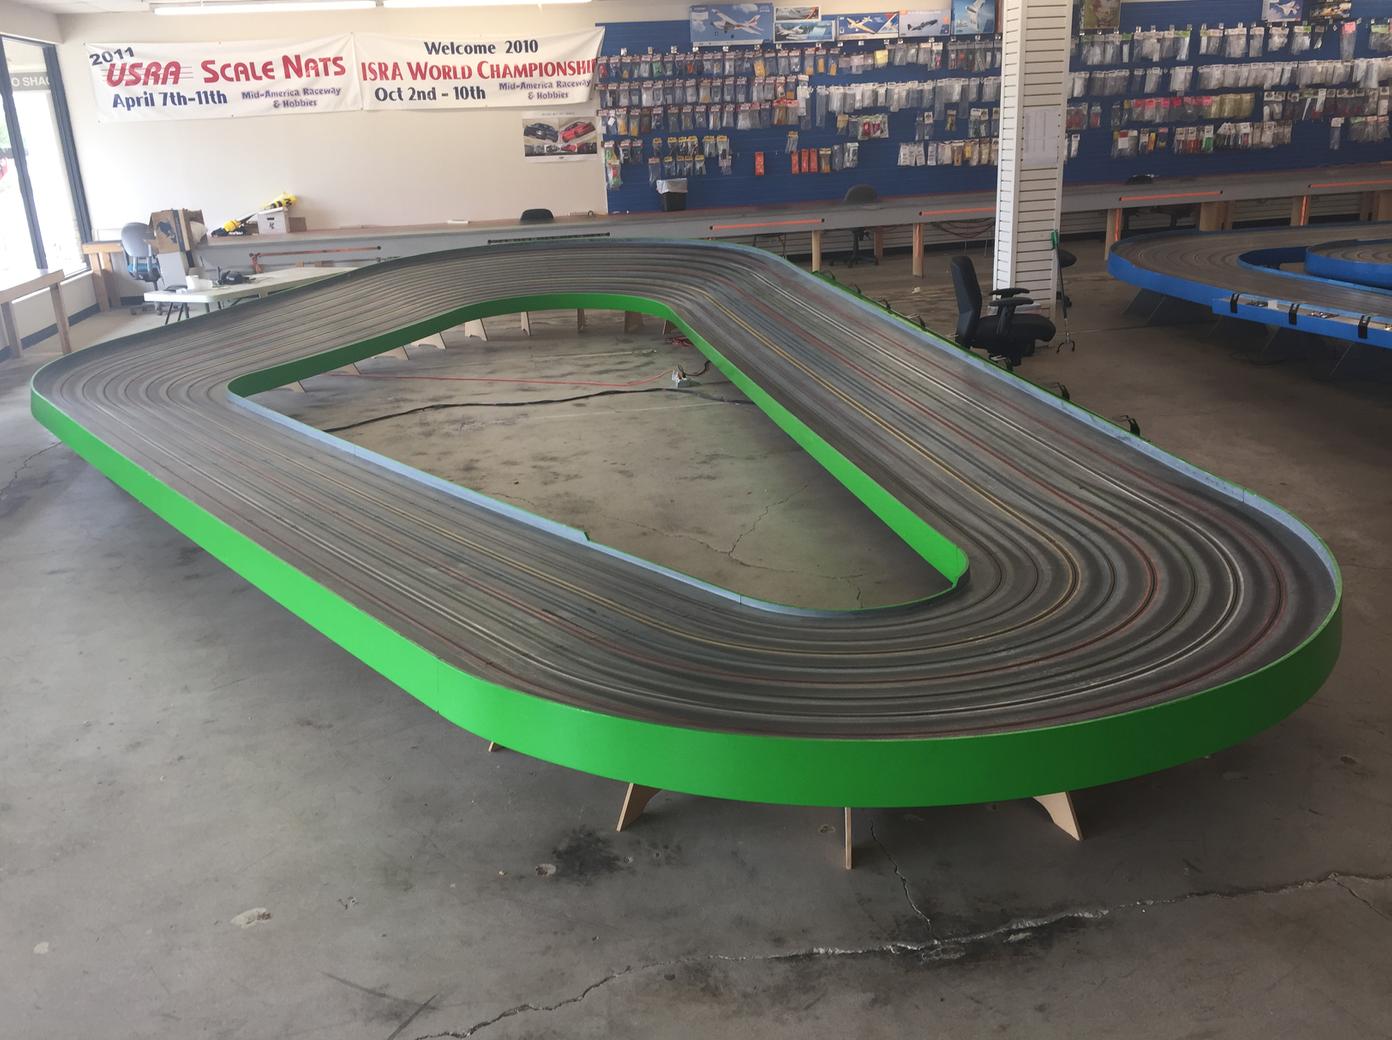 Gary Gerding Trioval Slot Car Racing Slot Car Tracks Slot Cars